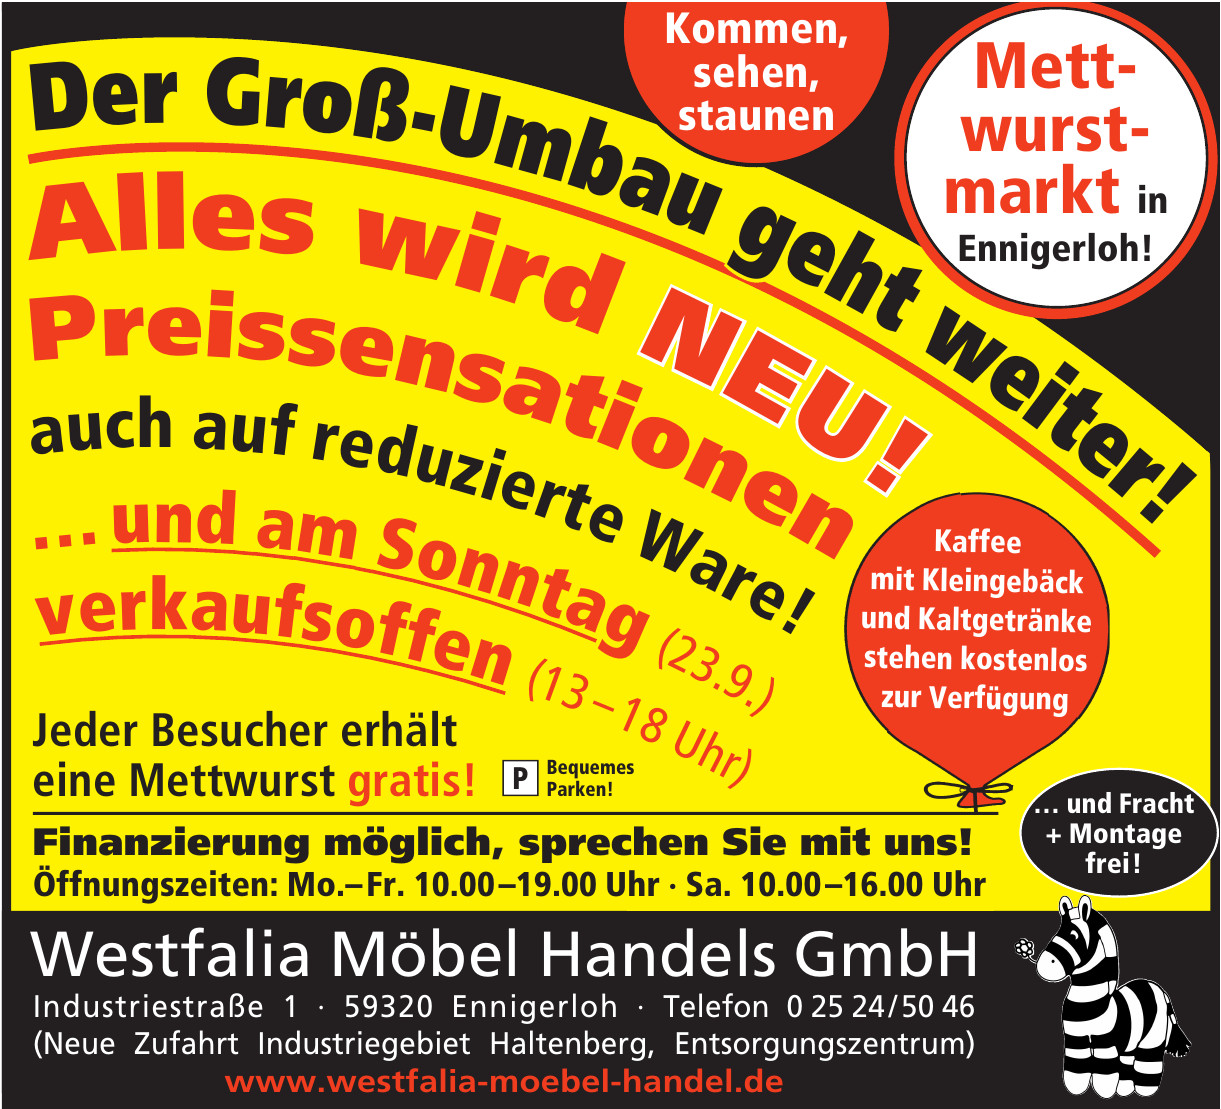 Westfalia Möbel Handels GmbH